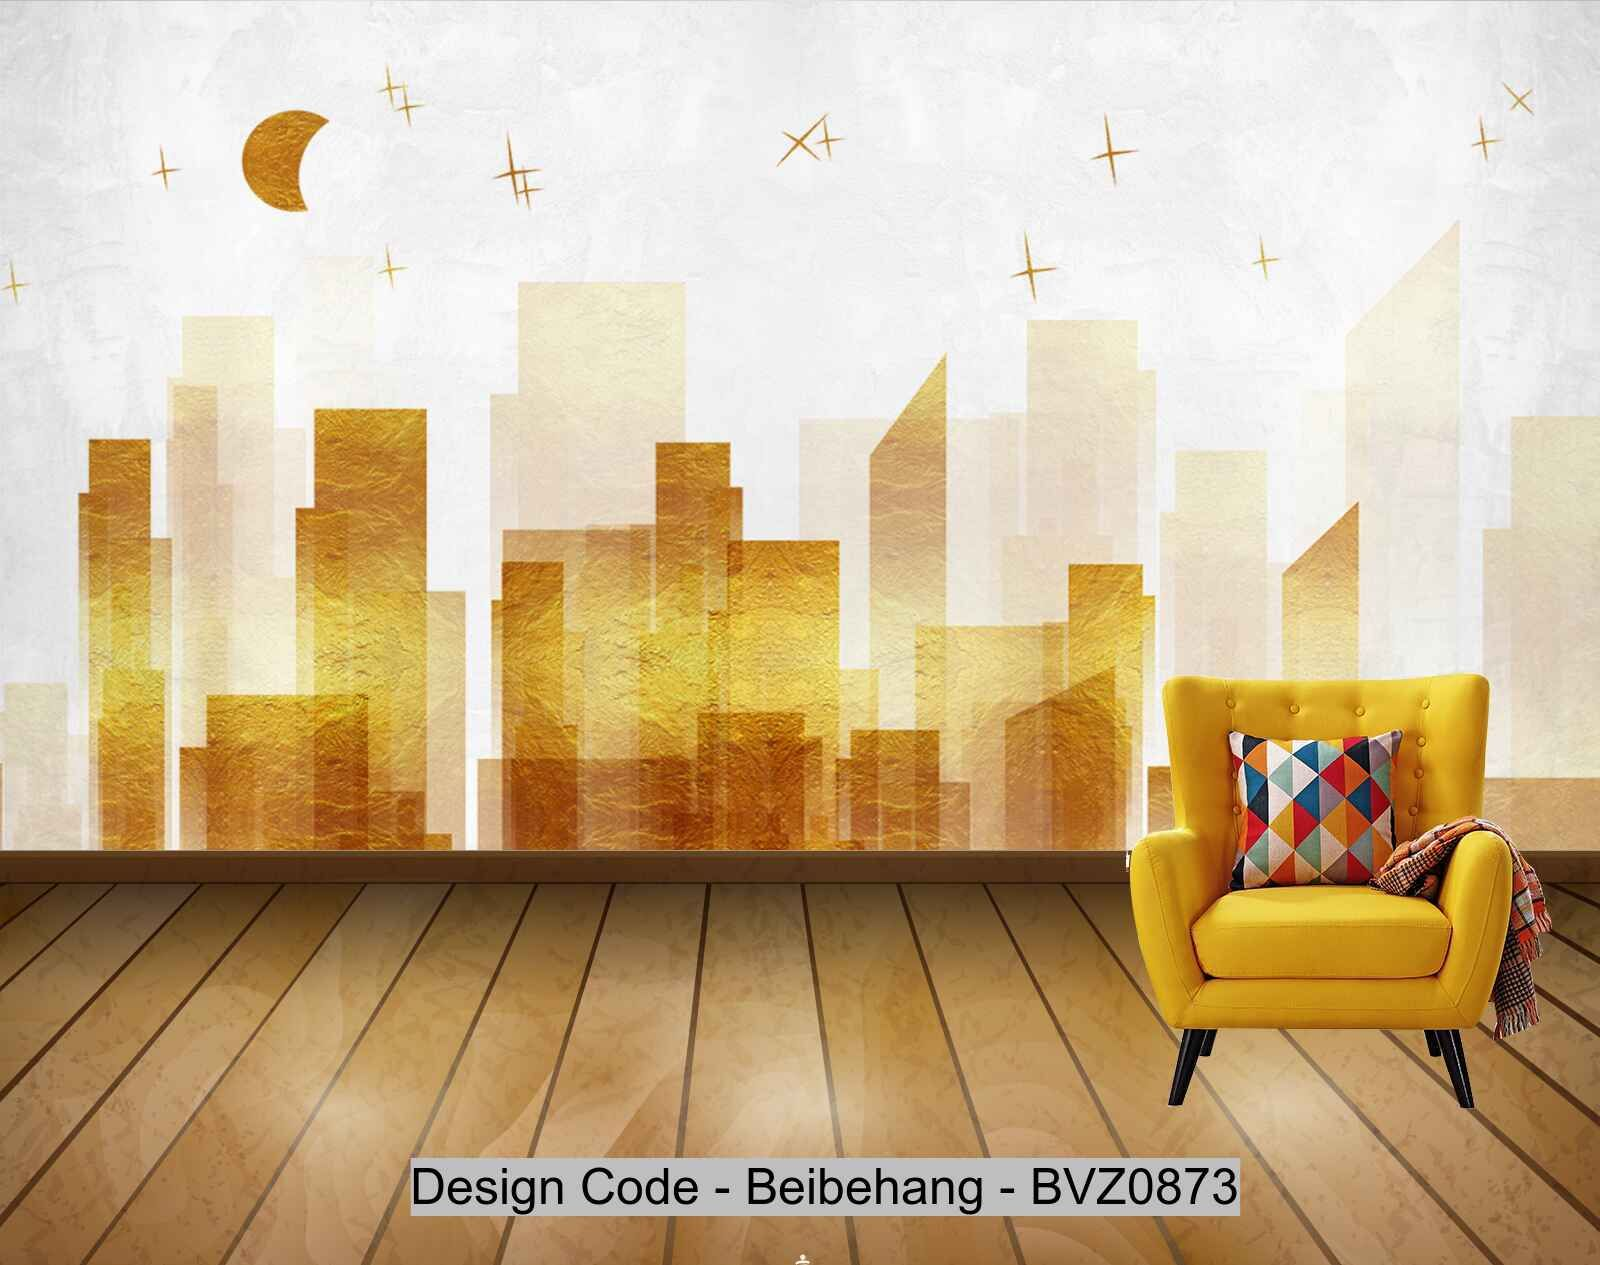 Beibehang Bvz0873 Modern Minimalistic Texture Golden Cit